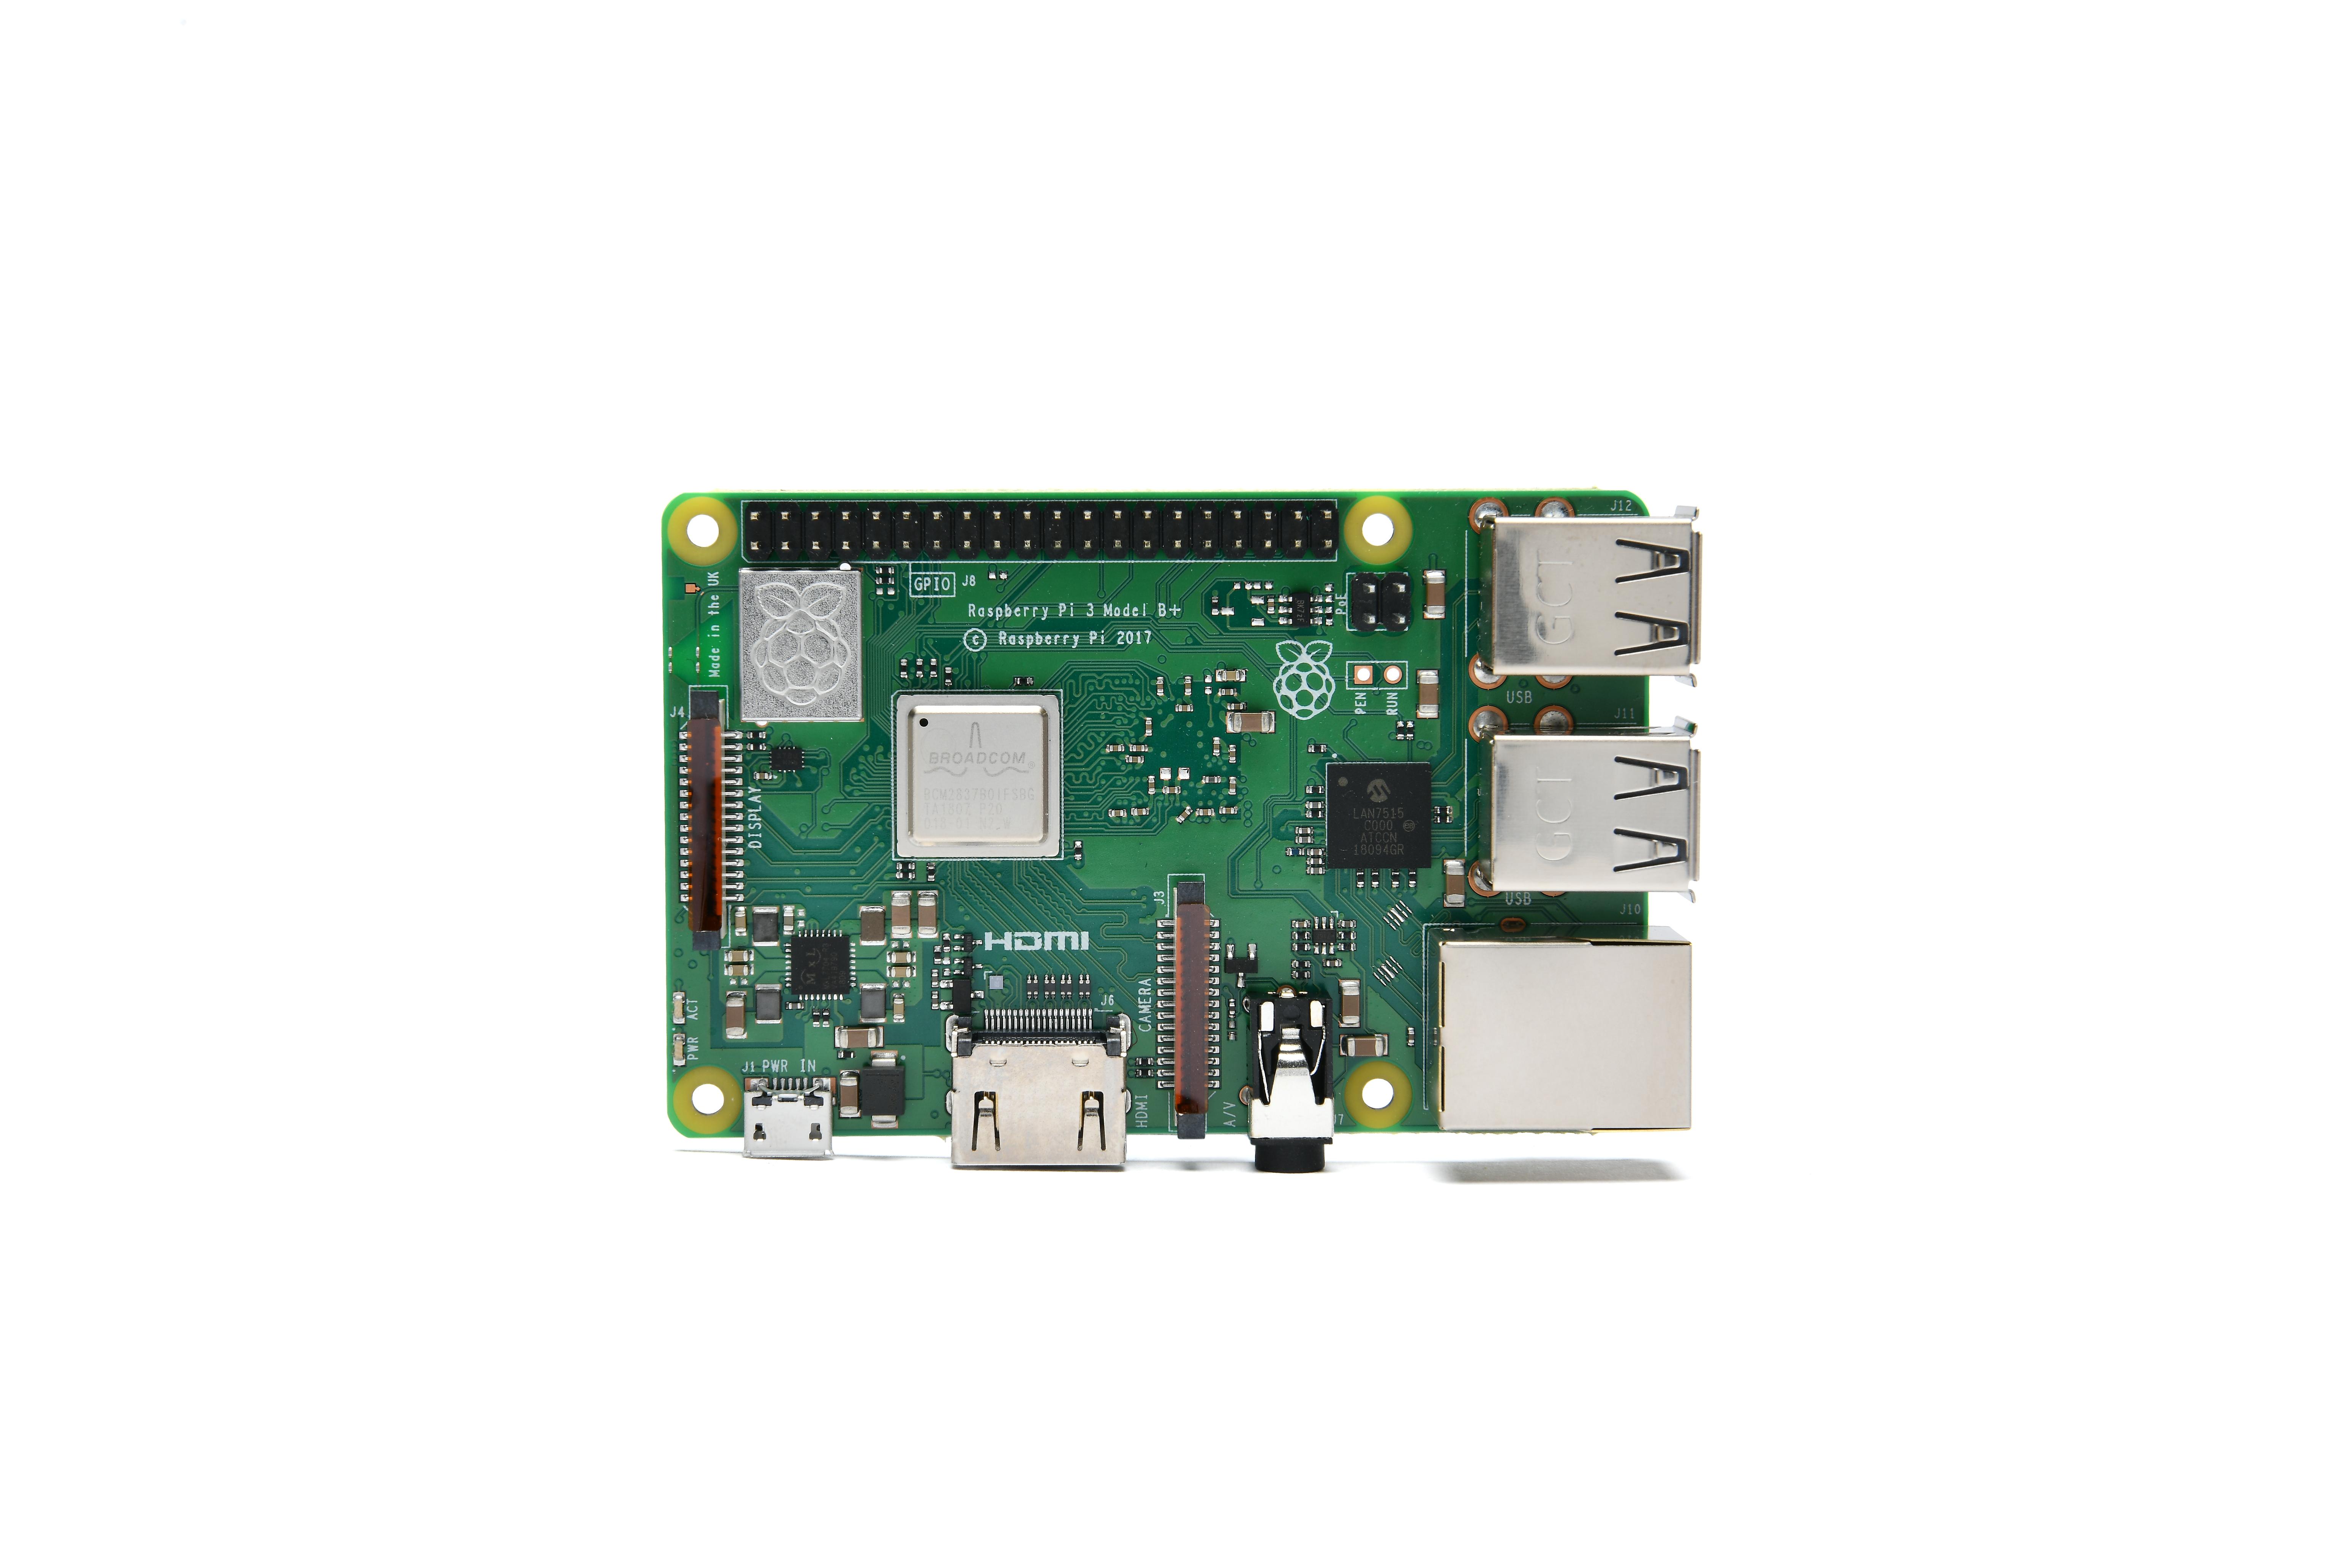 Raspberry Pi 3 Modell B+